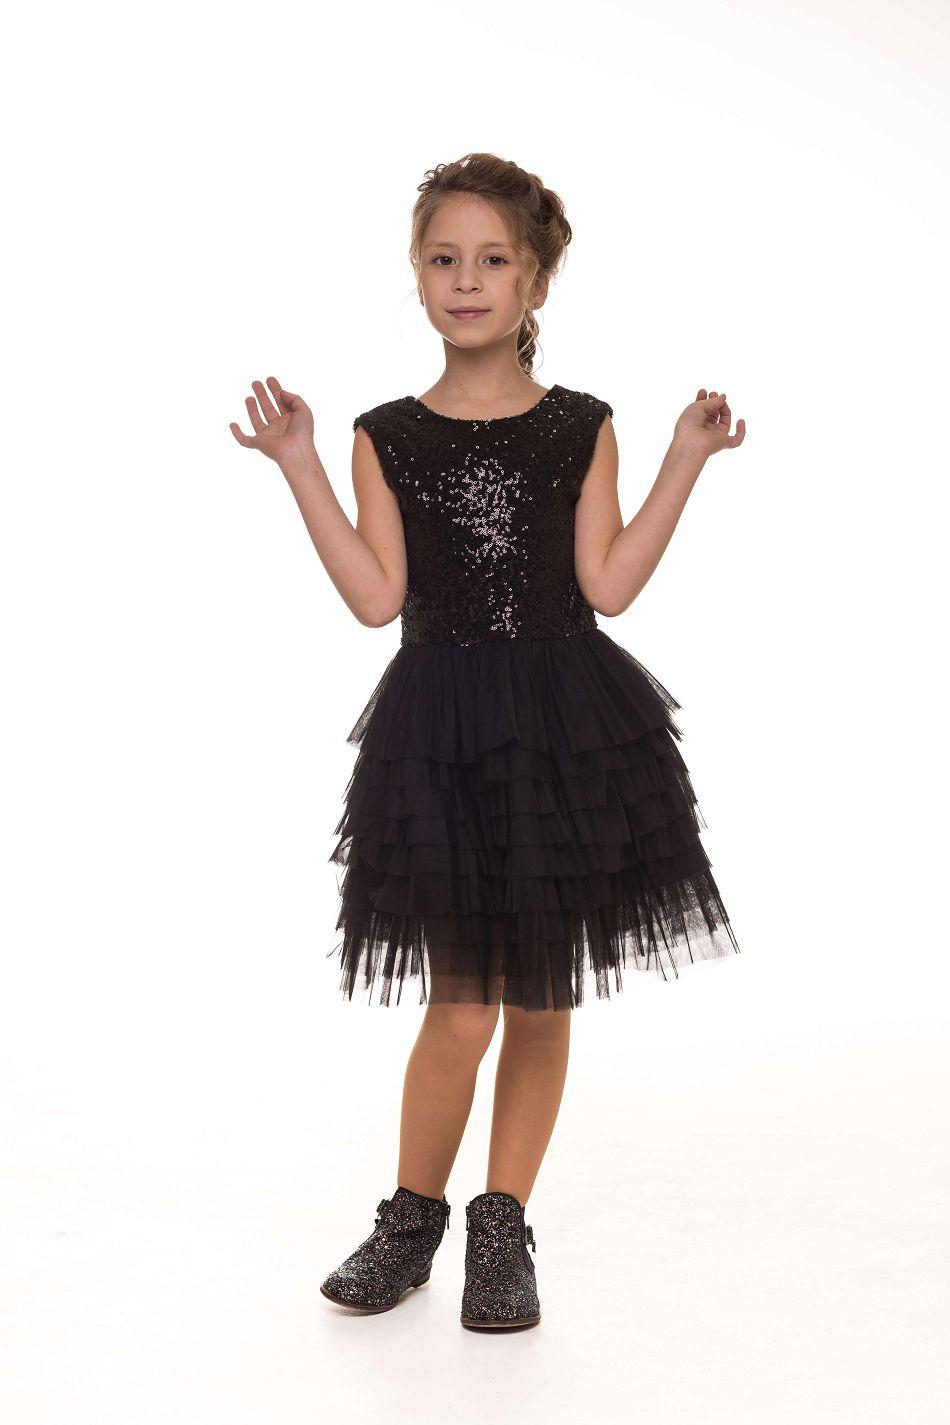 Красиве святкове плаття на дівчинку чорне